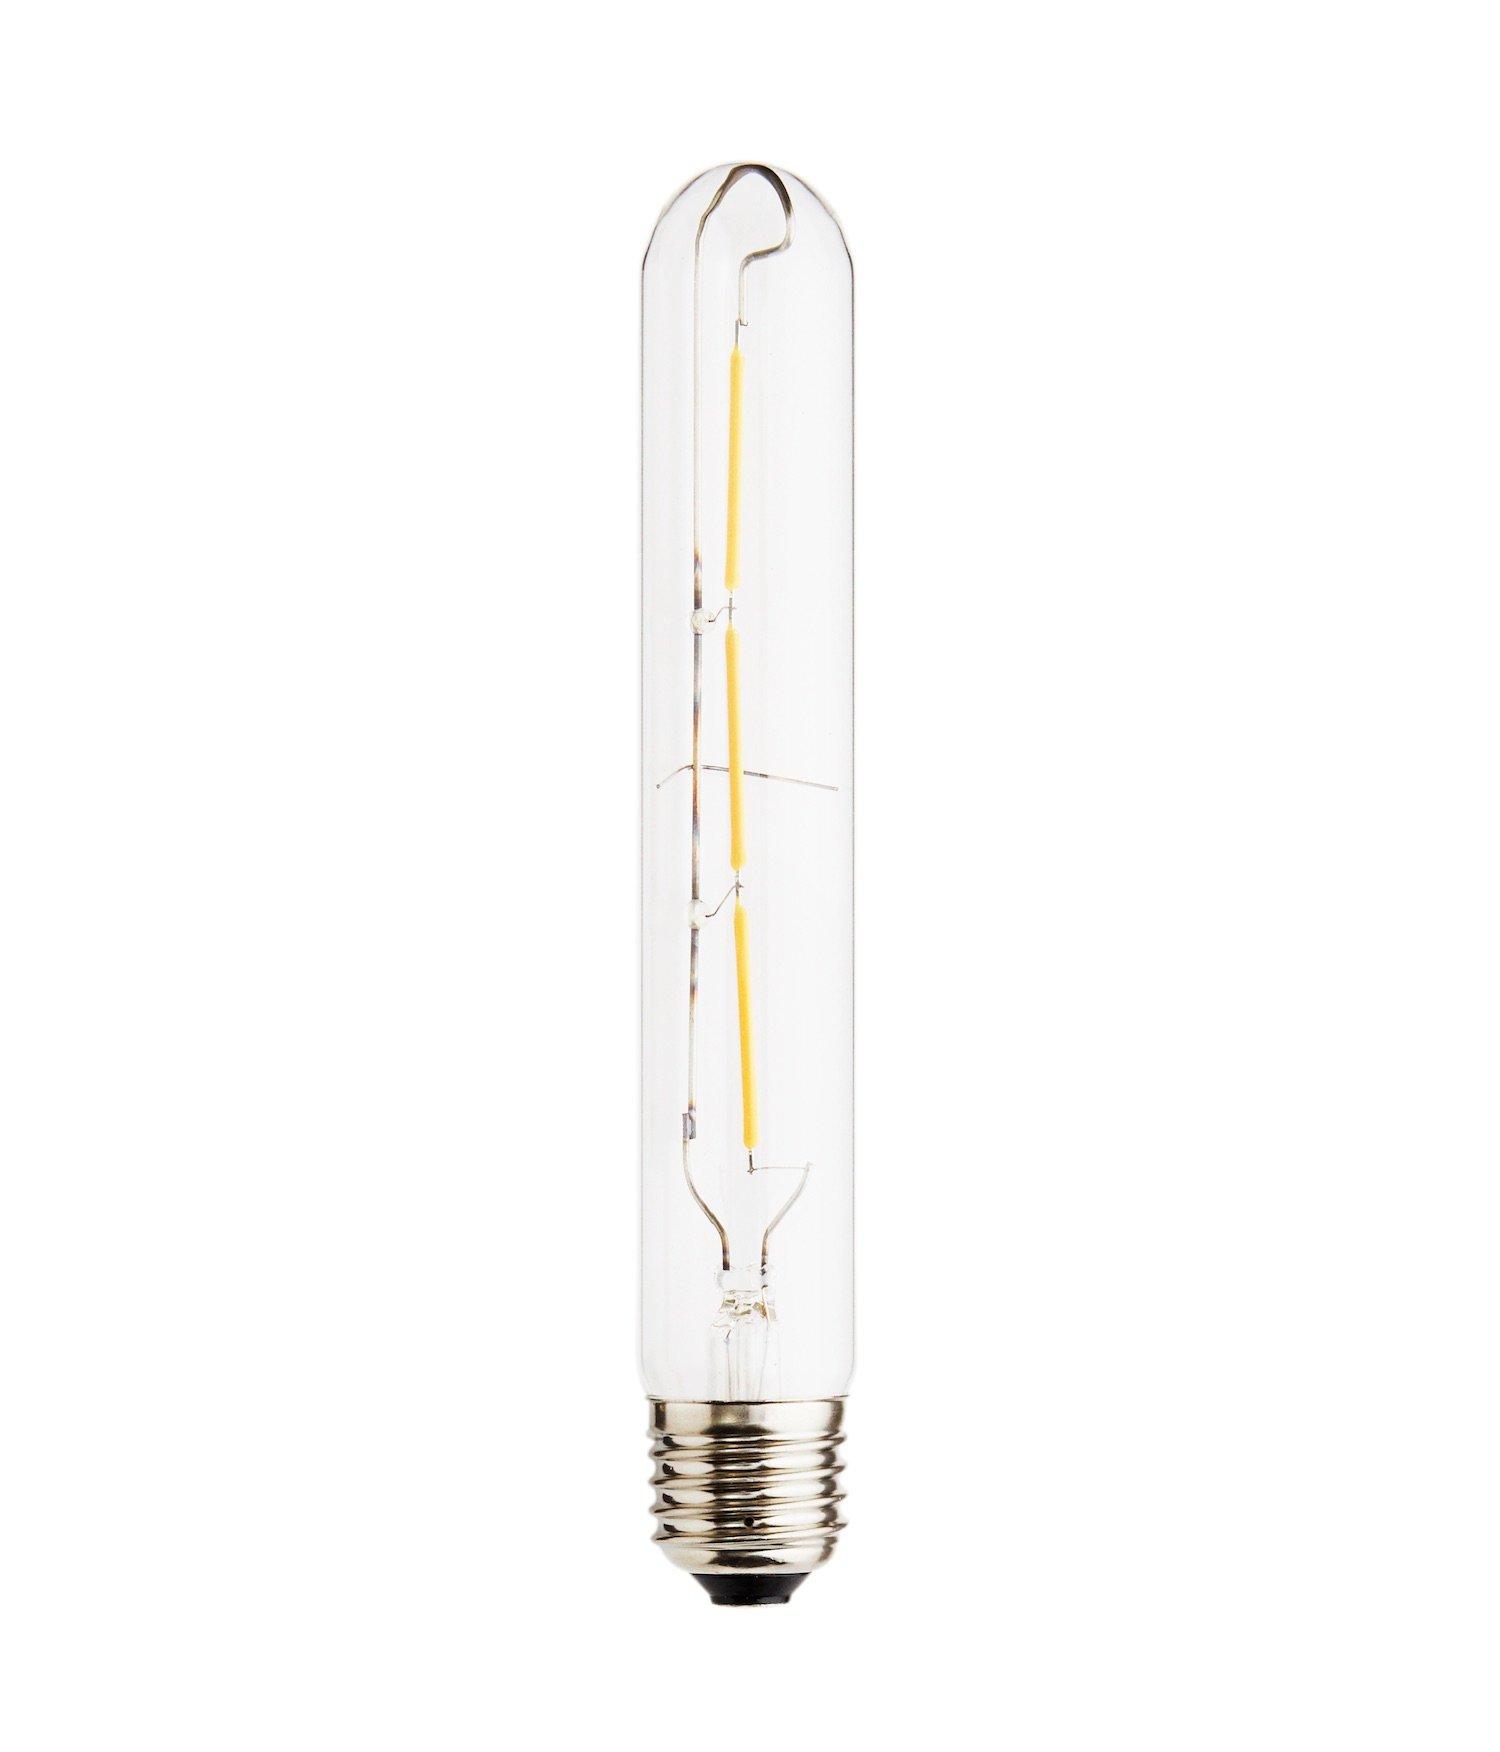 Ljuskälla/Glödlampa LED 3W E27